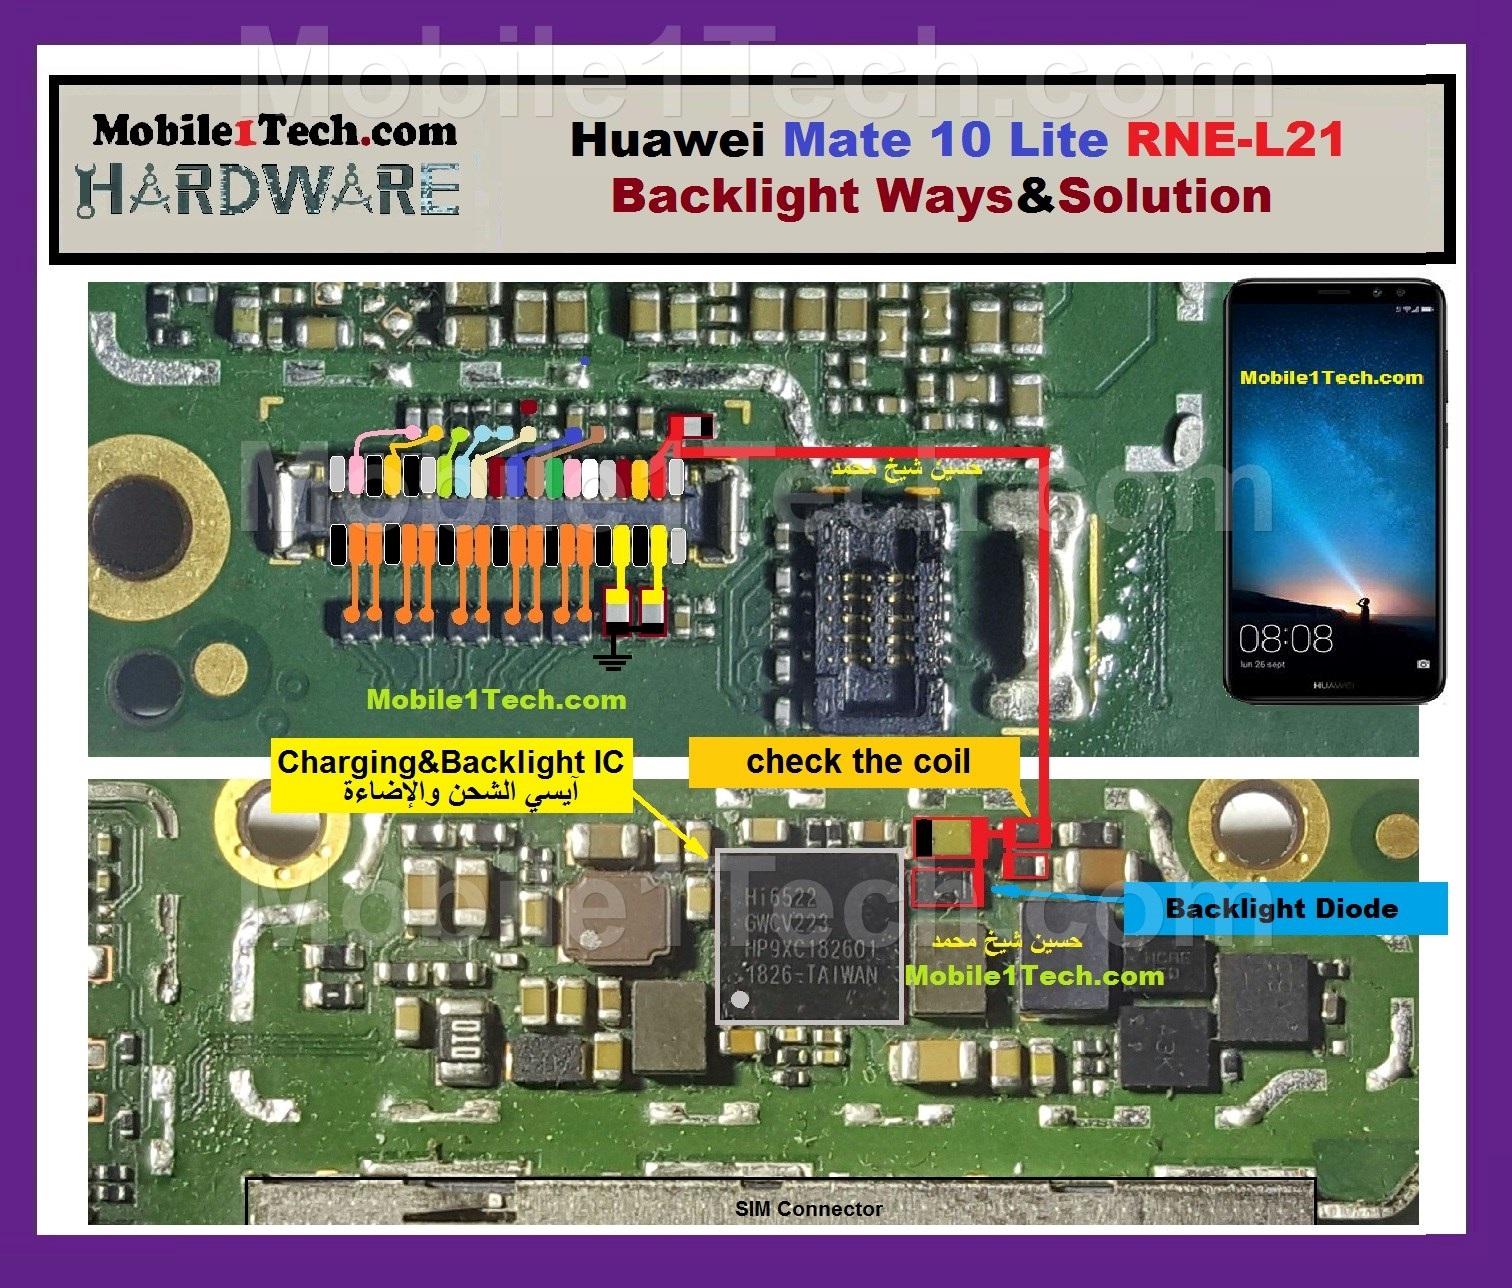 Huawei Mate 10 Lite Backlight Ways | Mobile1Tech